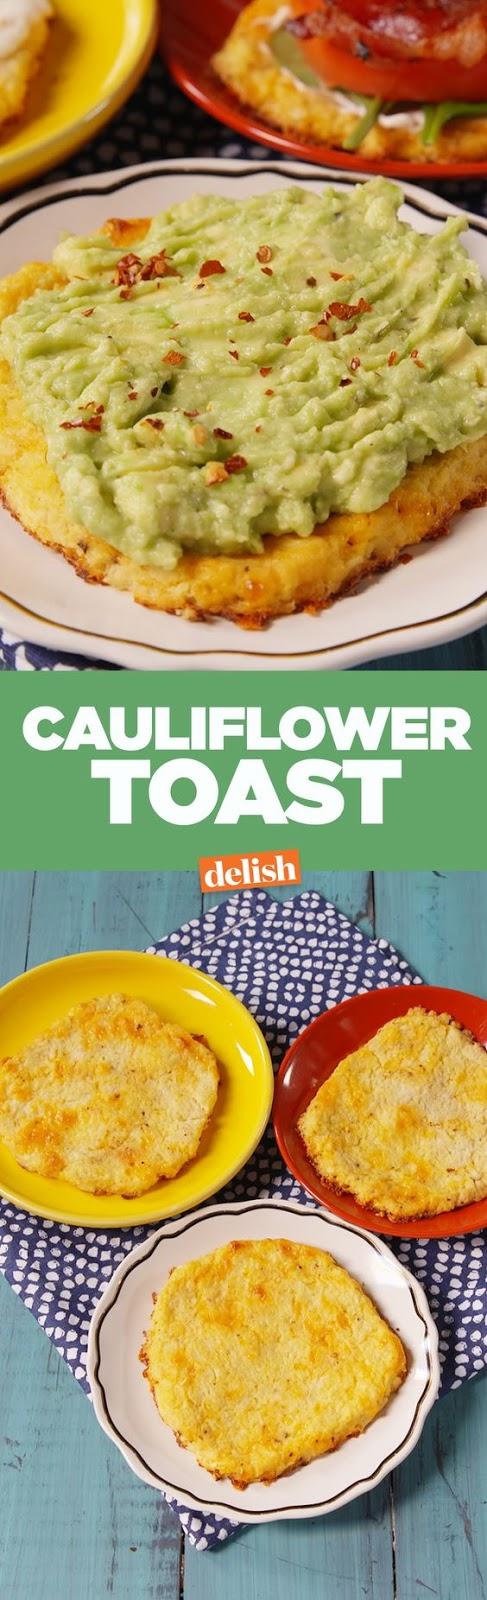 Cauliflower Toast